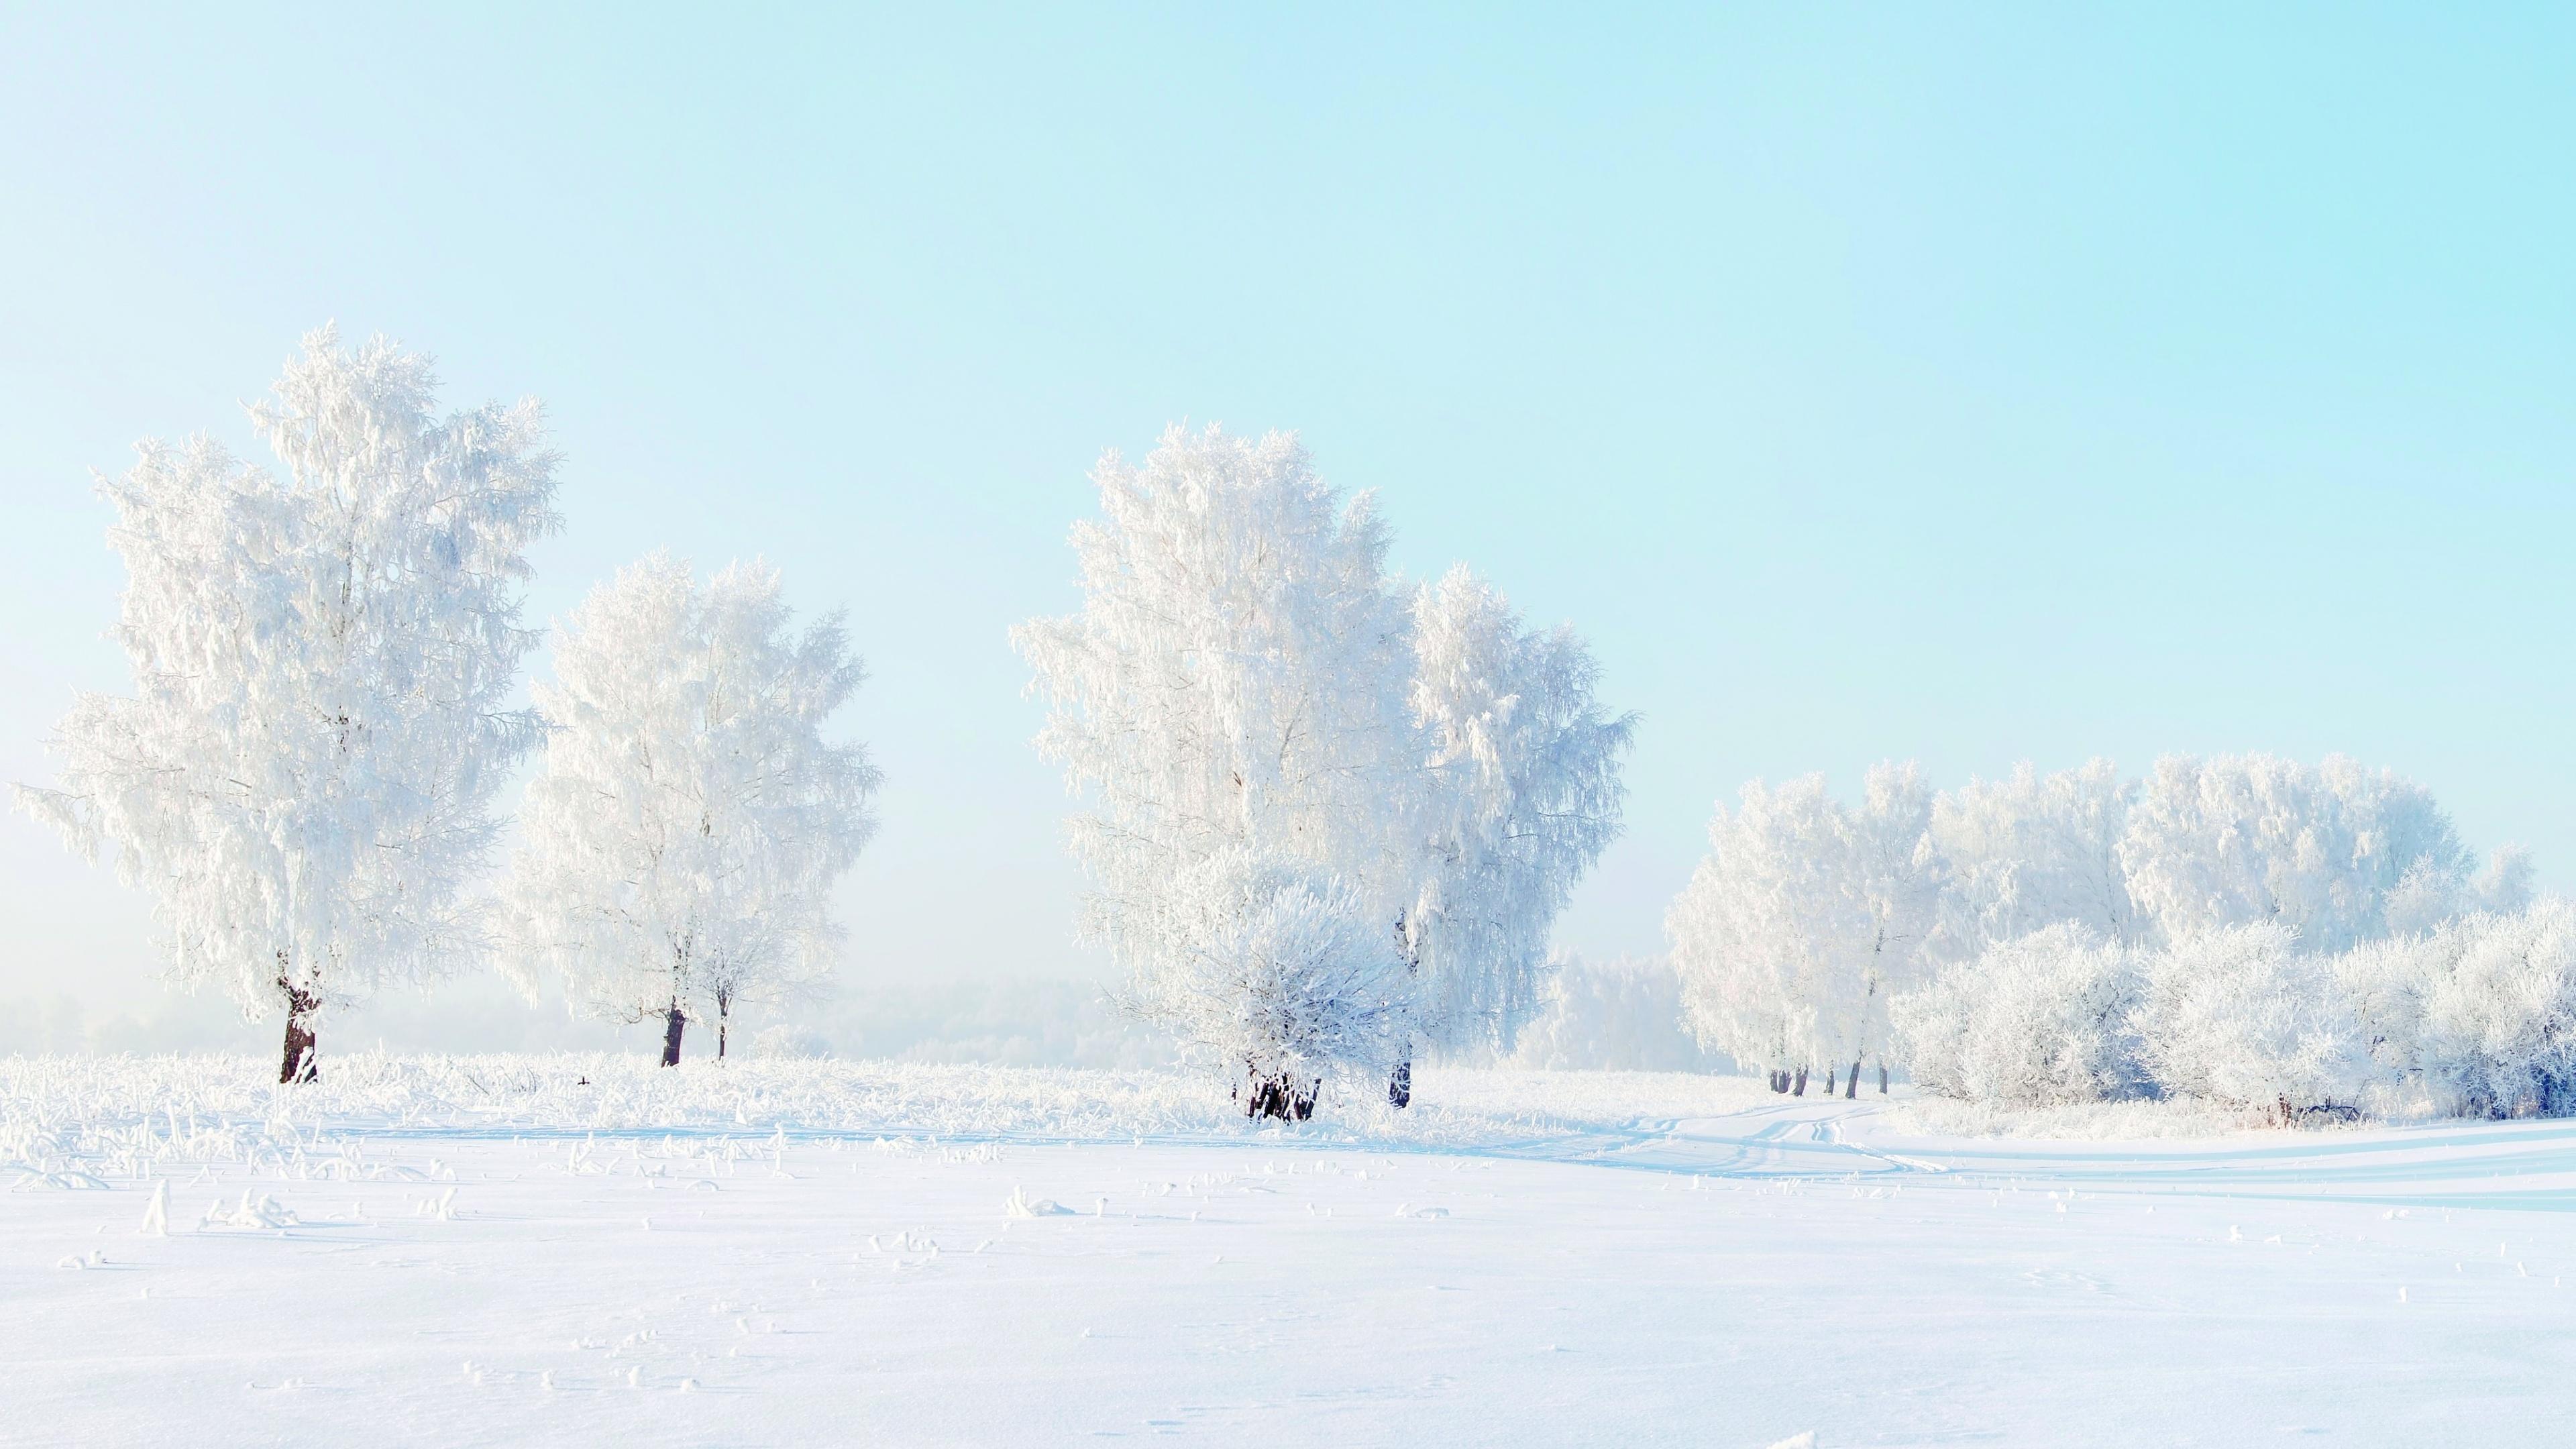 Winter Snow Pictures Wallpaper - WallpaperSafari